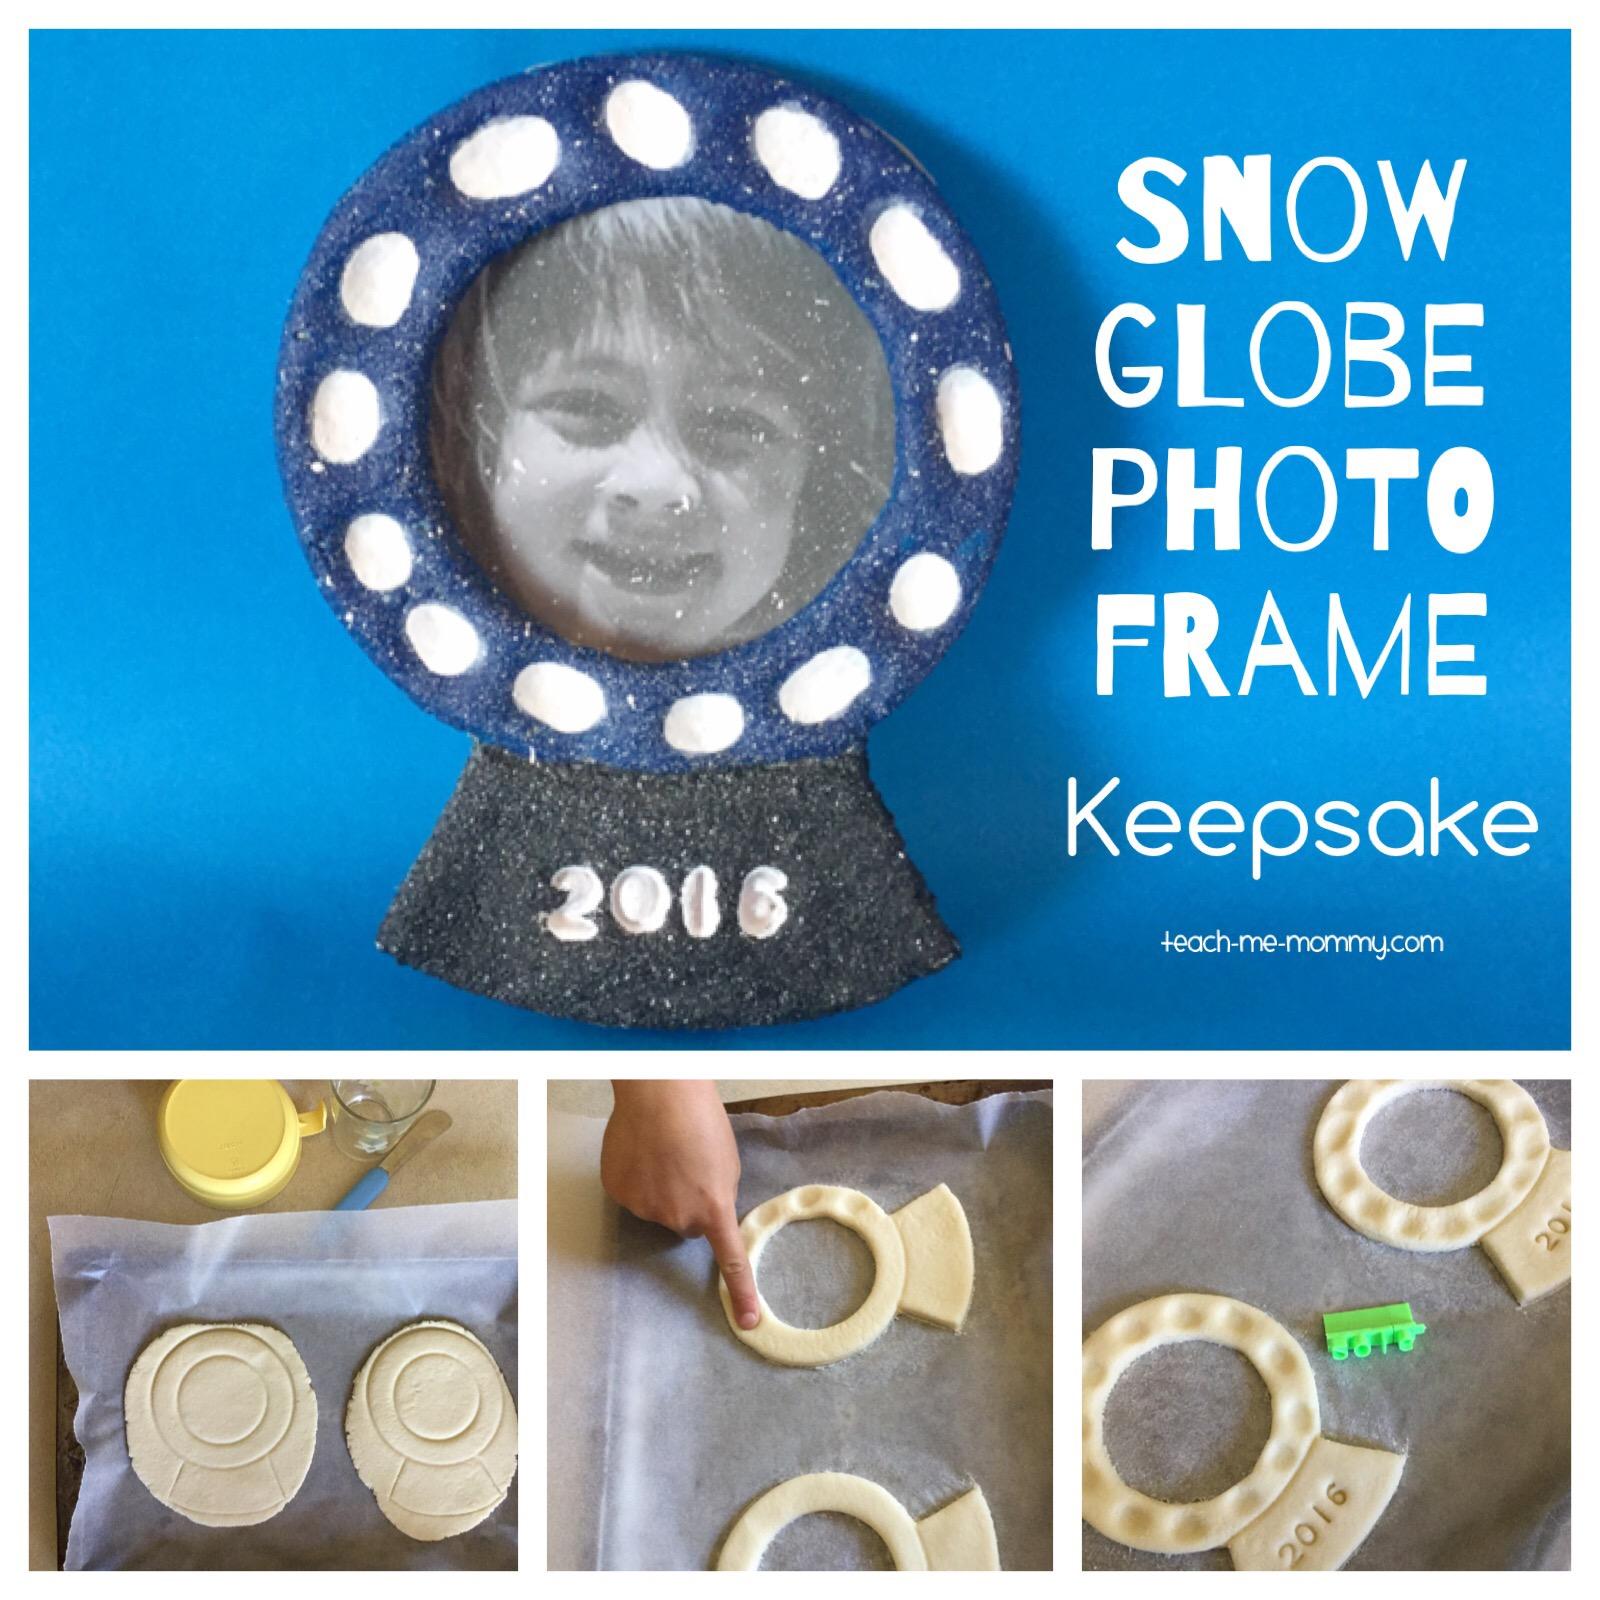 snow globe photo keepsake